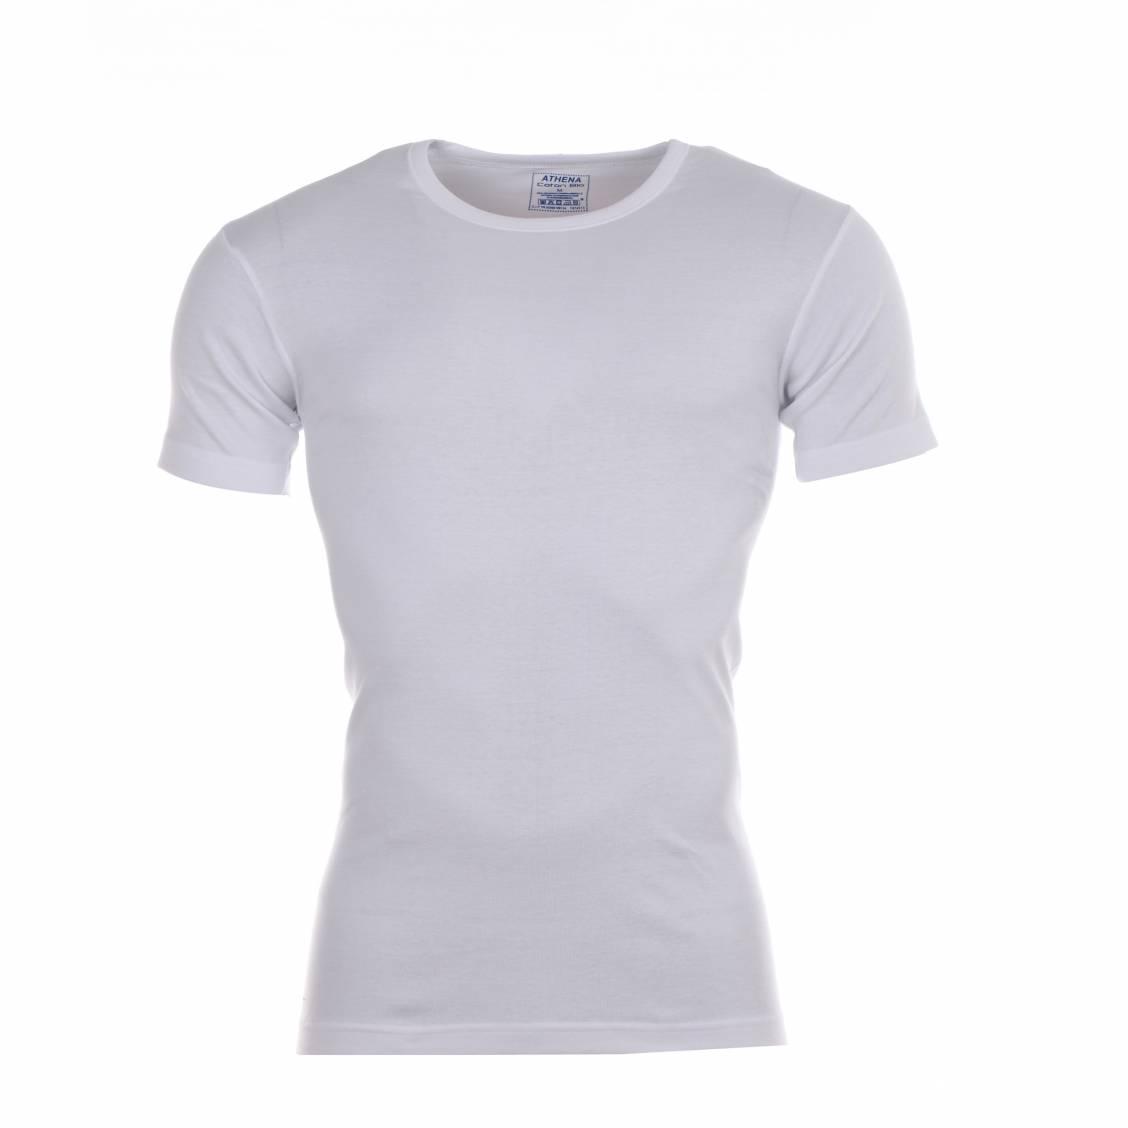 lot de 2 tee-shirts en coton bio blanc